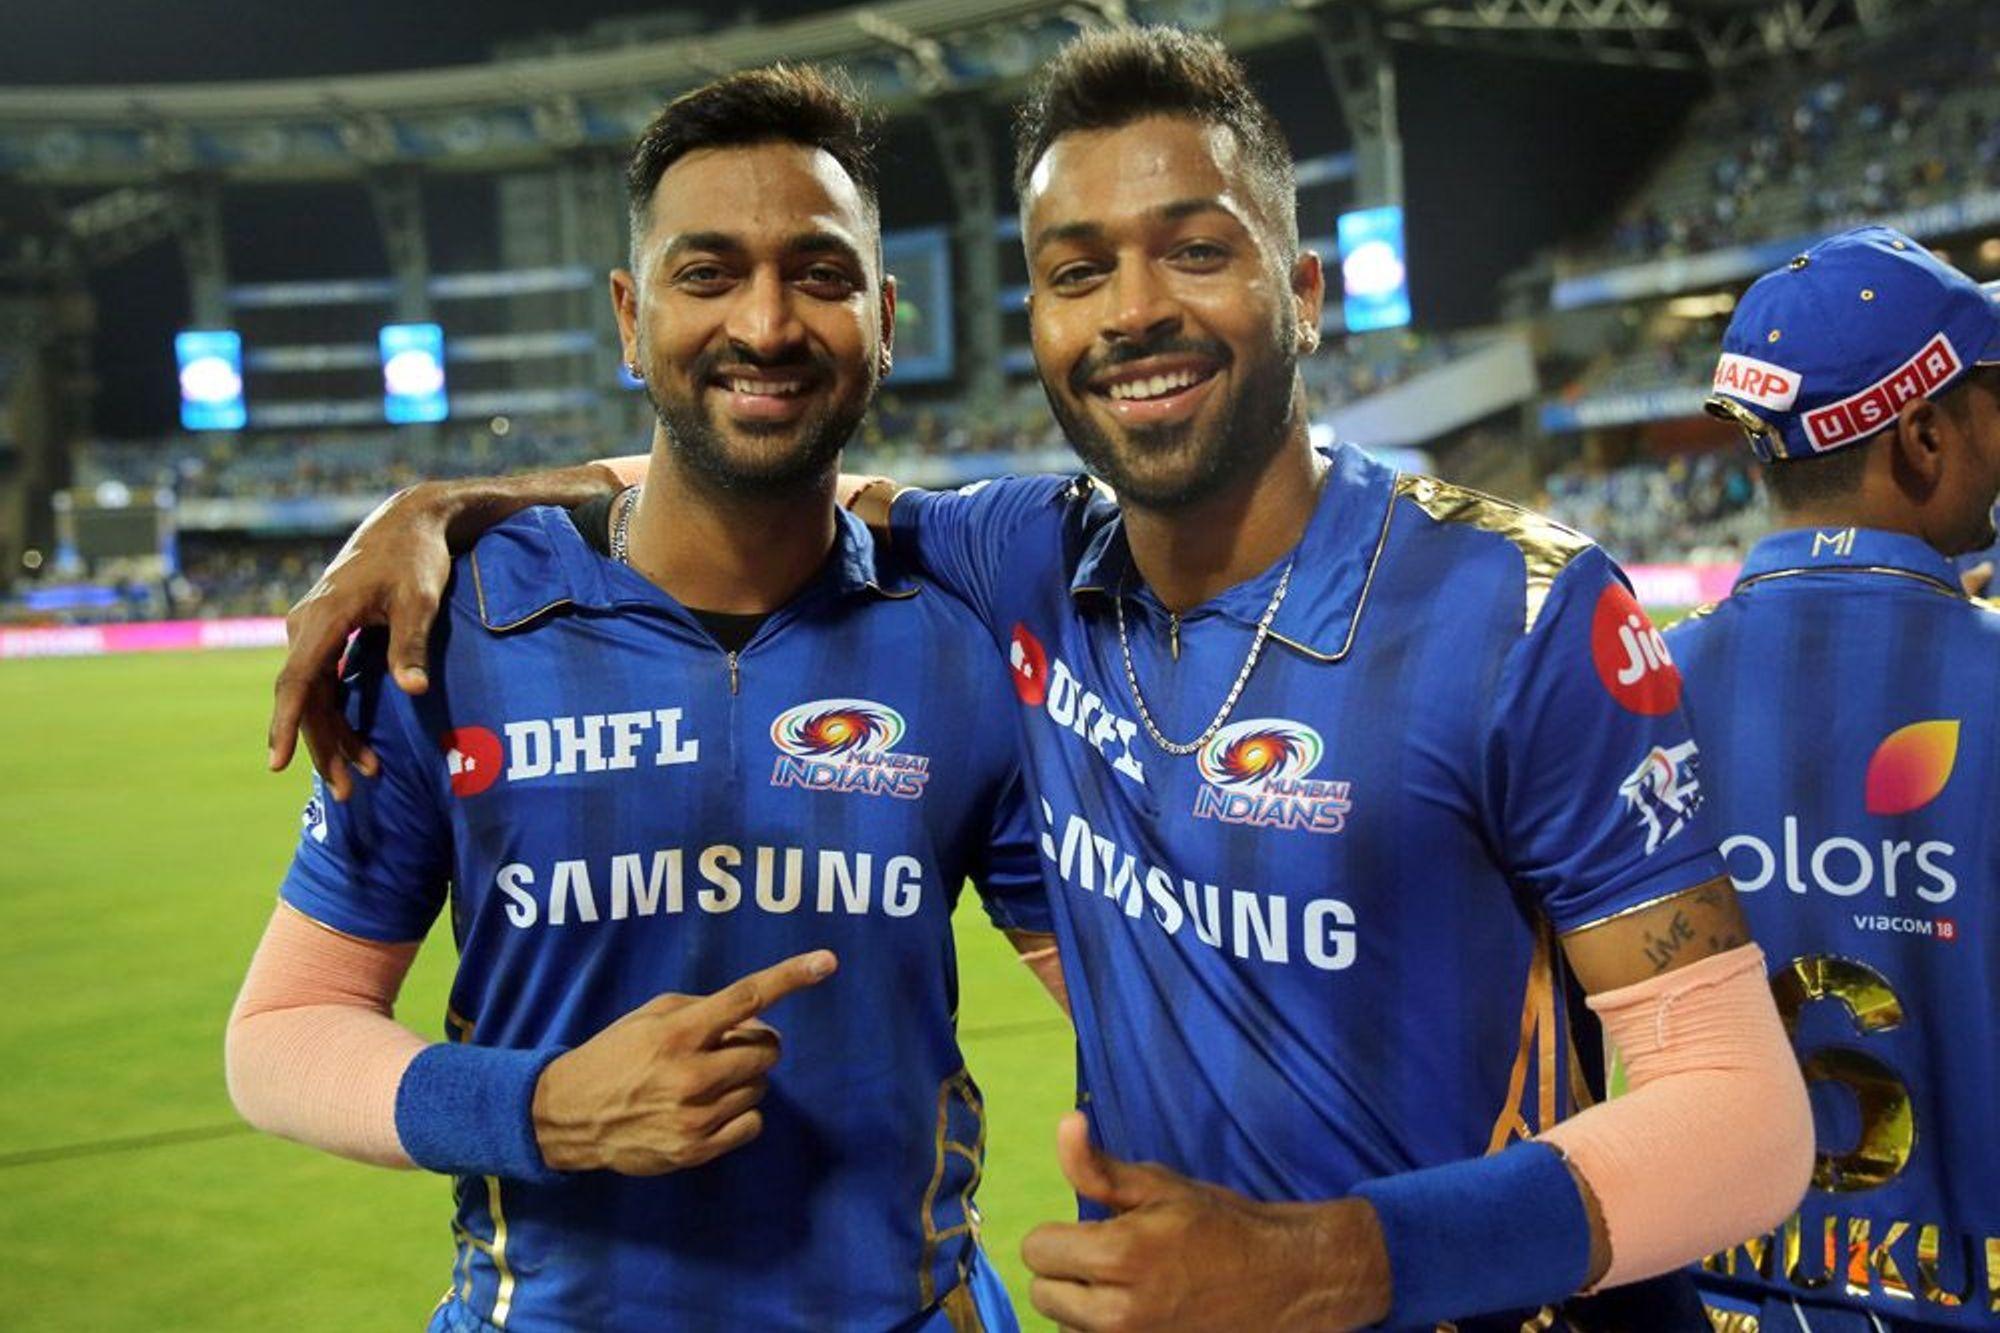 Ipl 2019 I Am Very Happy With The Way Hardik Pandya Is Batting Krunal Pandya Ipl Cricket Teams Chennai Super Kings